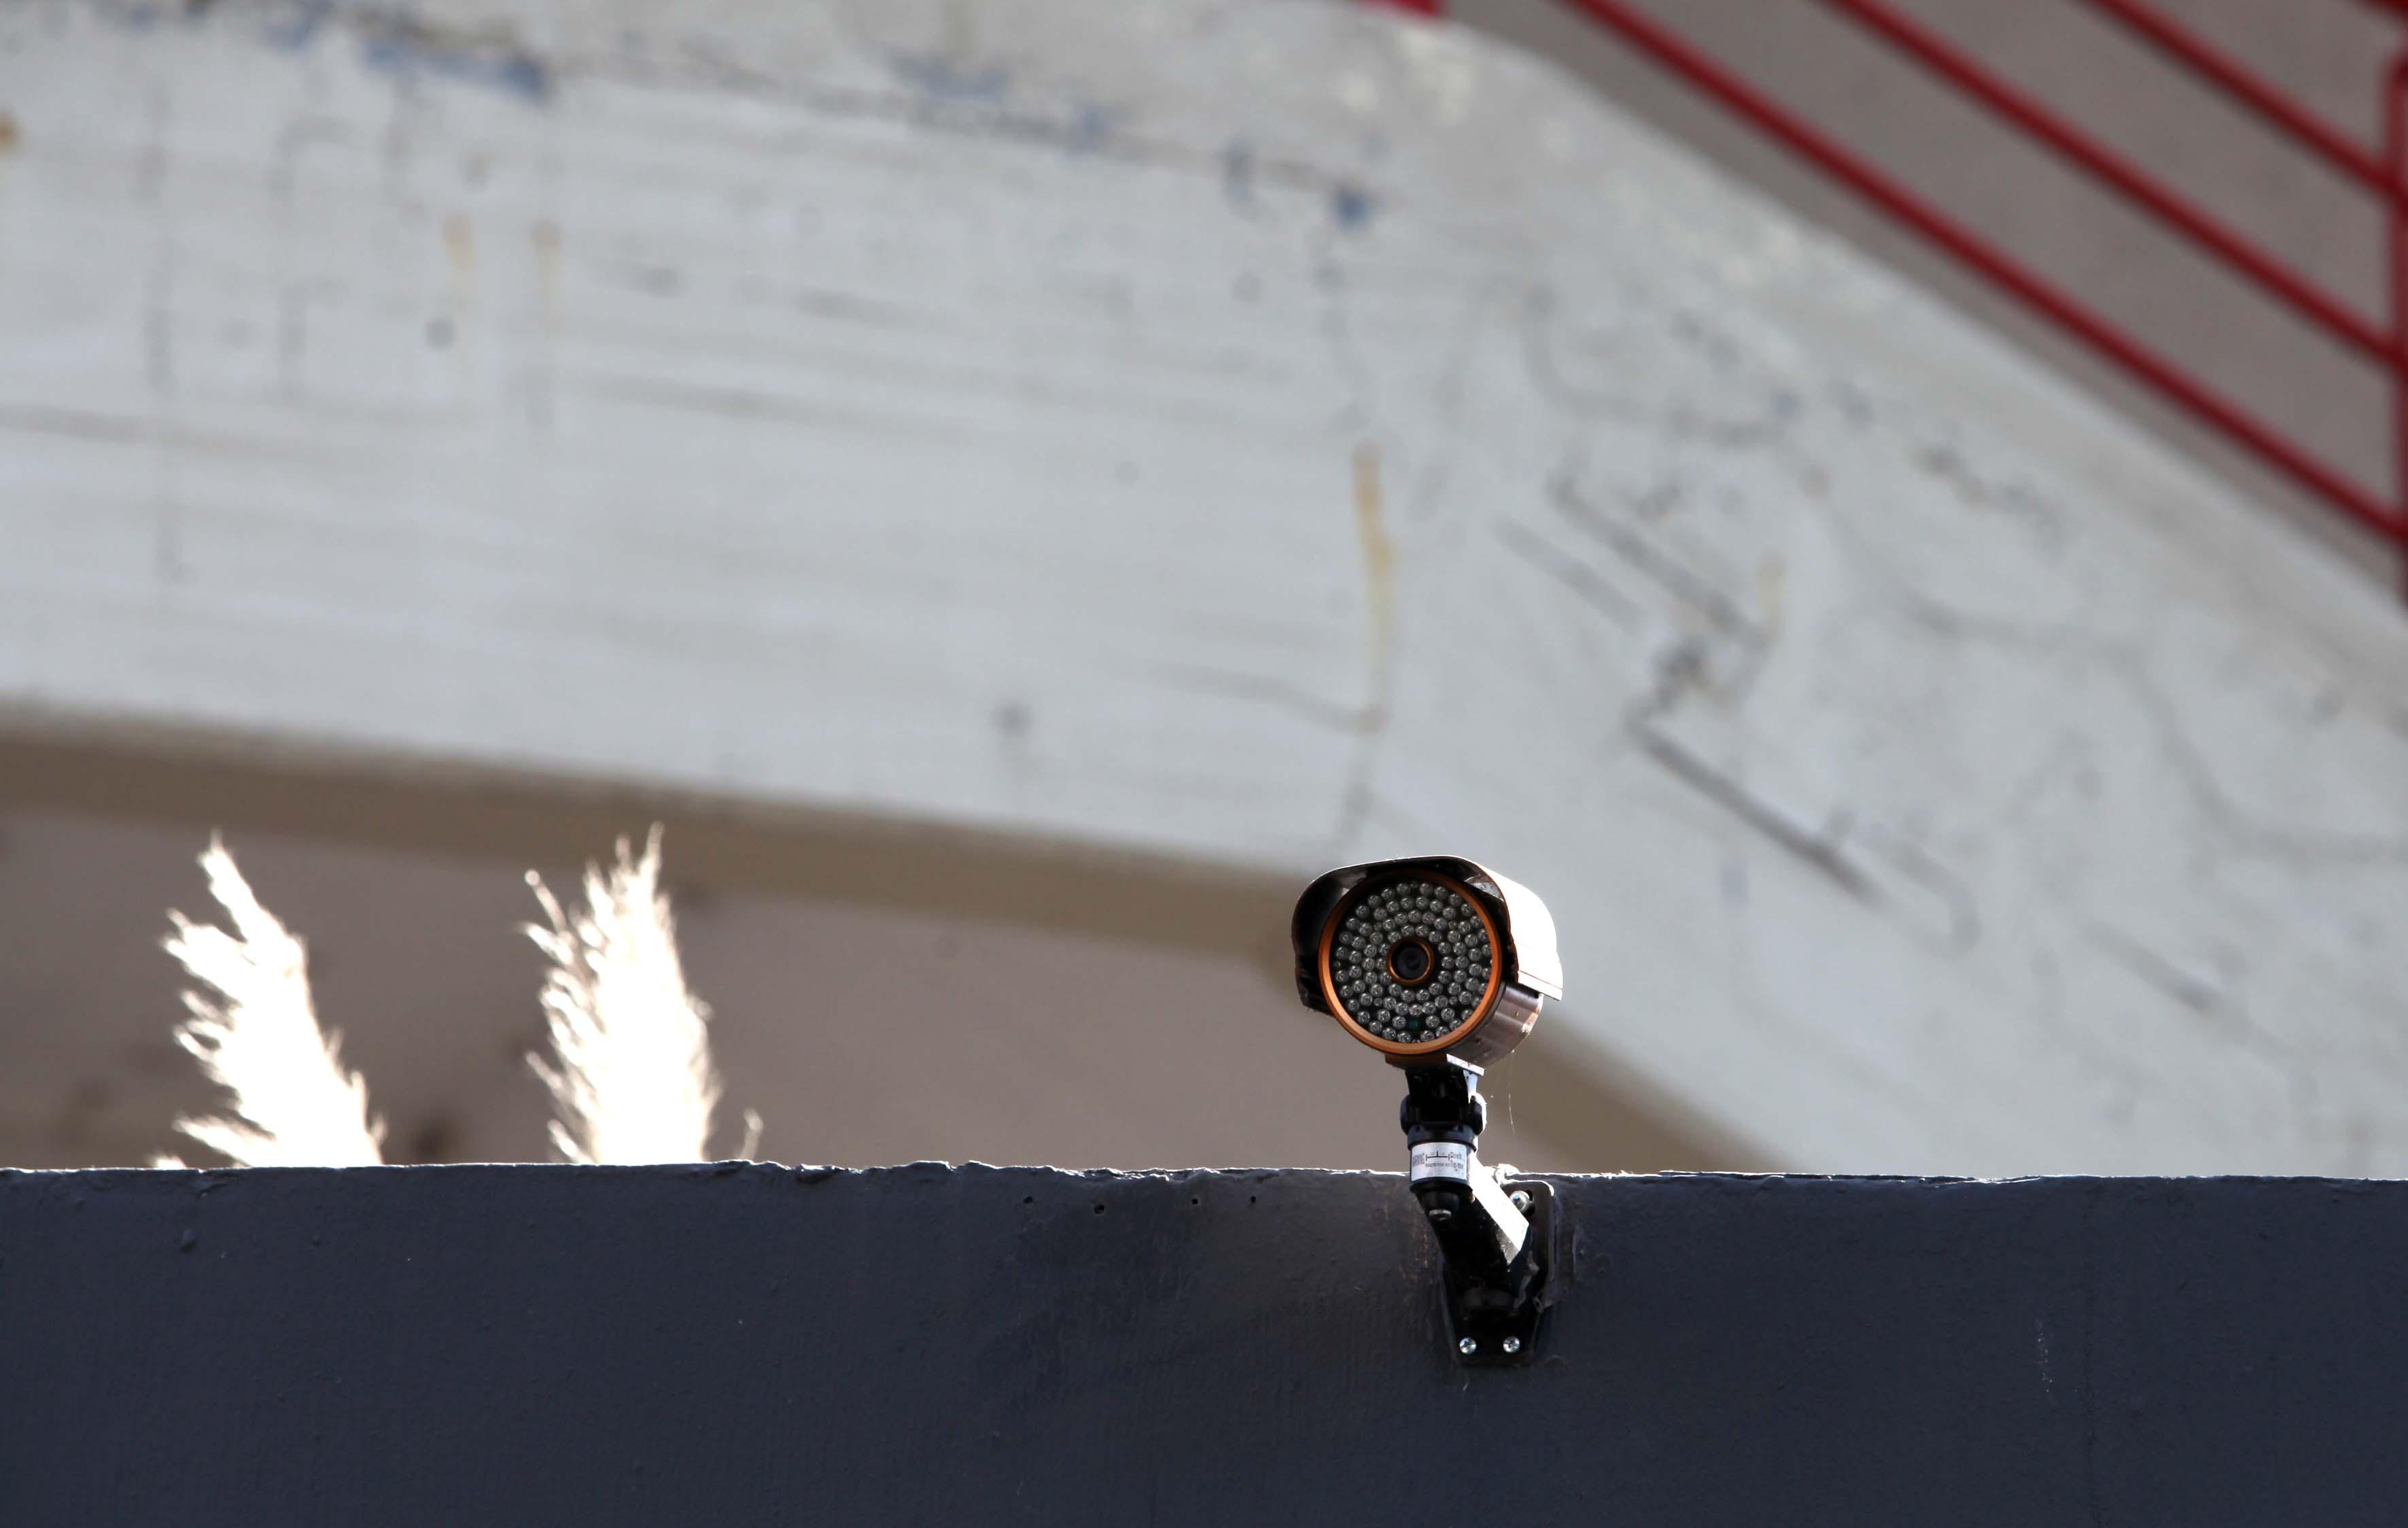 Cámara de vigilancia con iluminación de led